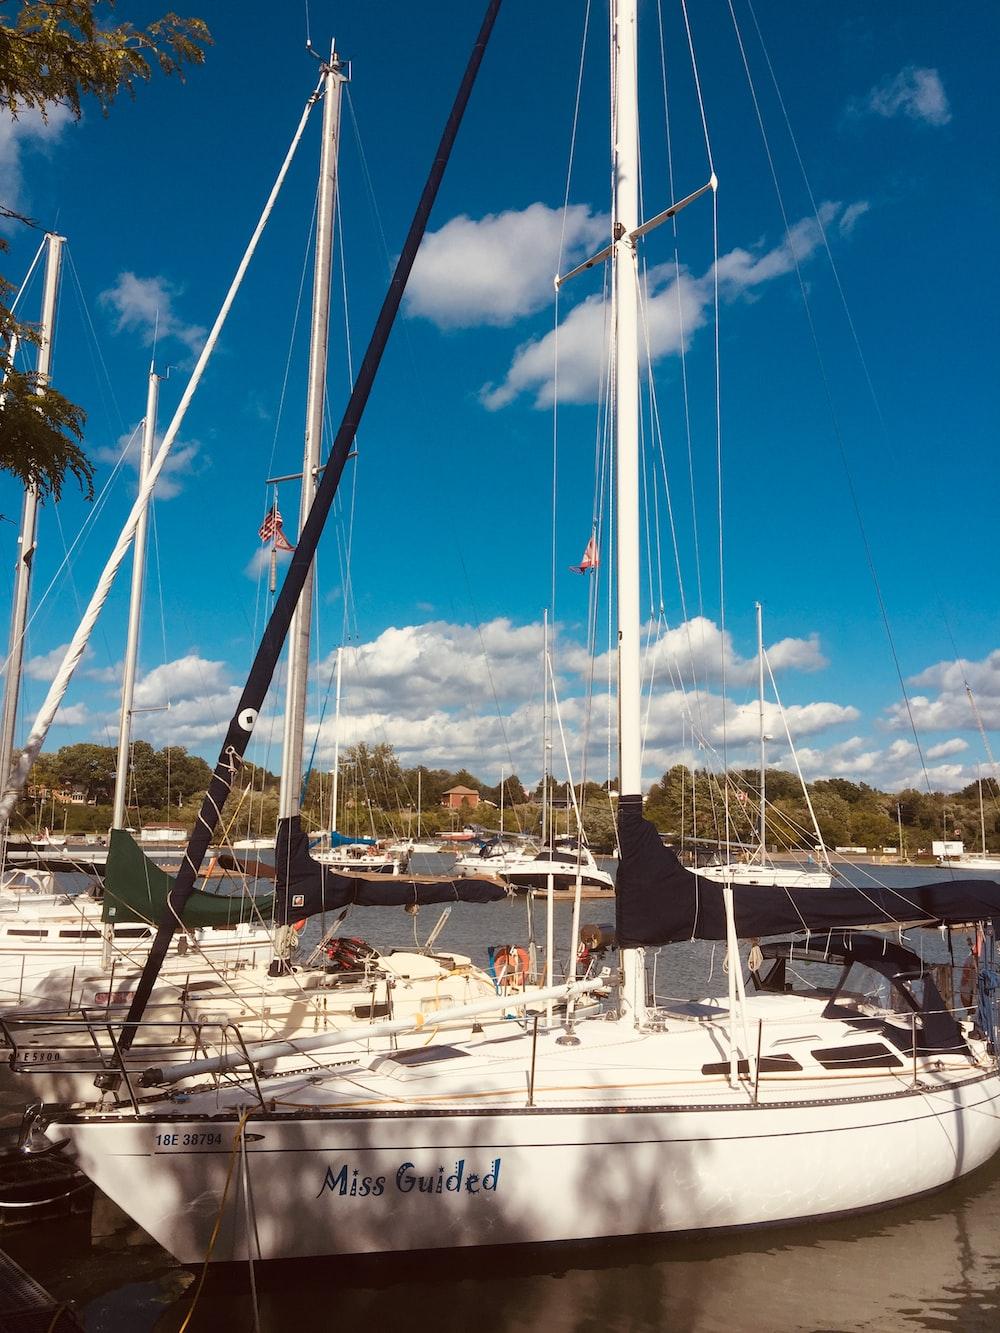 white sail boat on dock during daytime